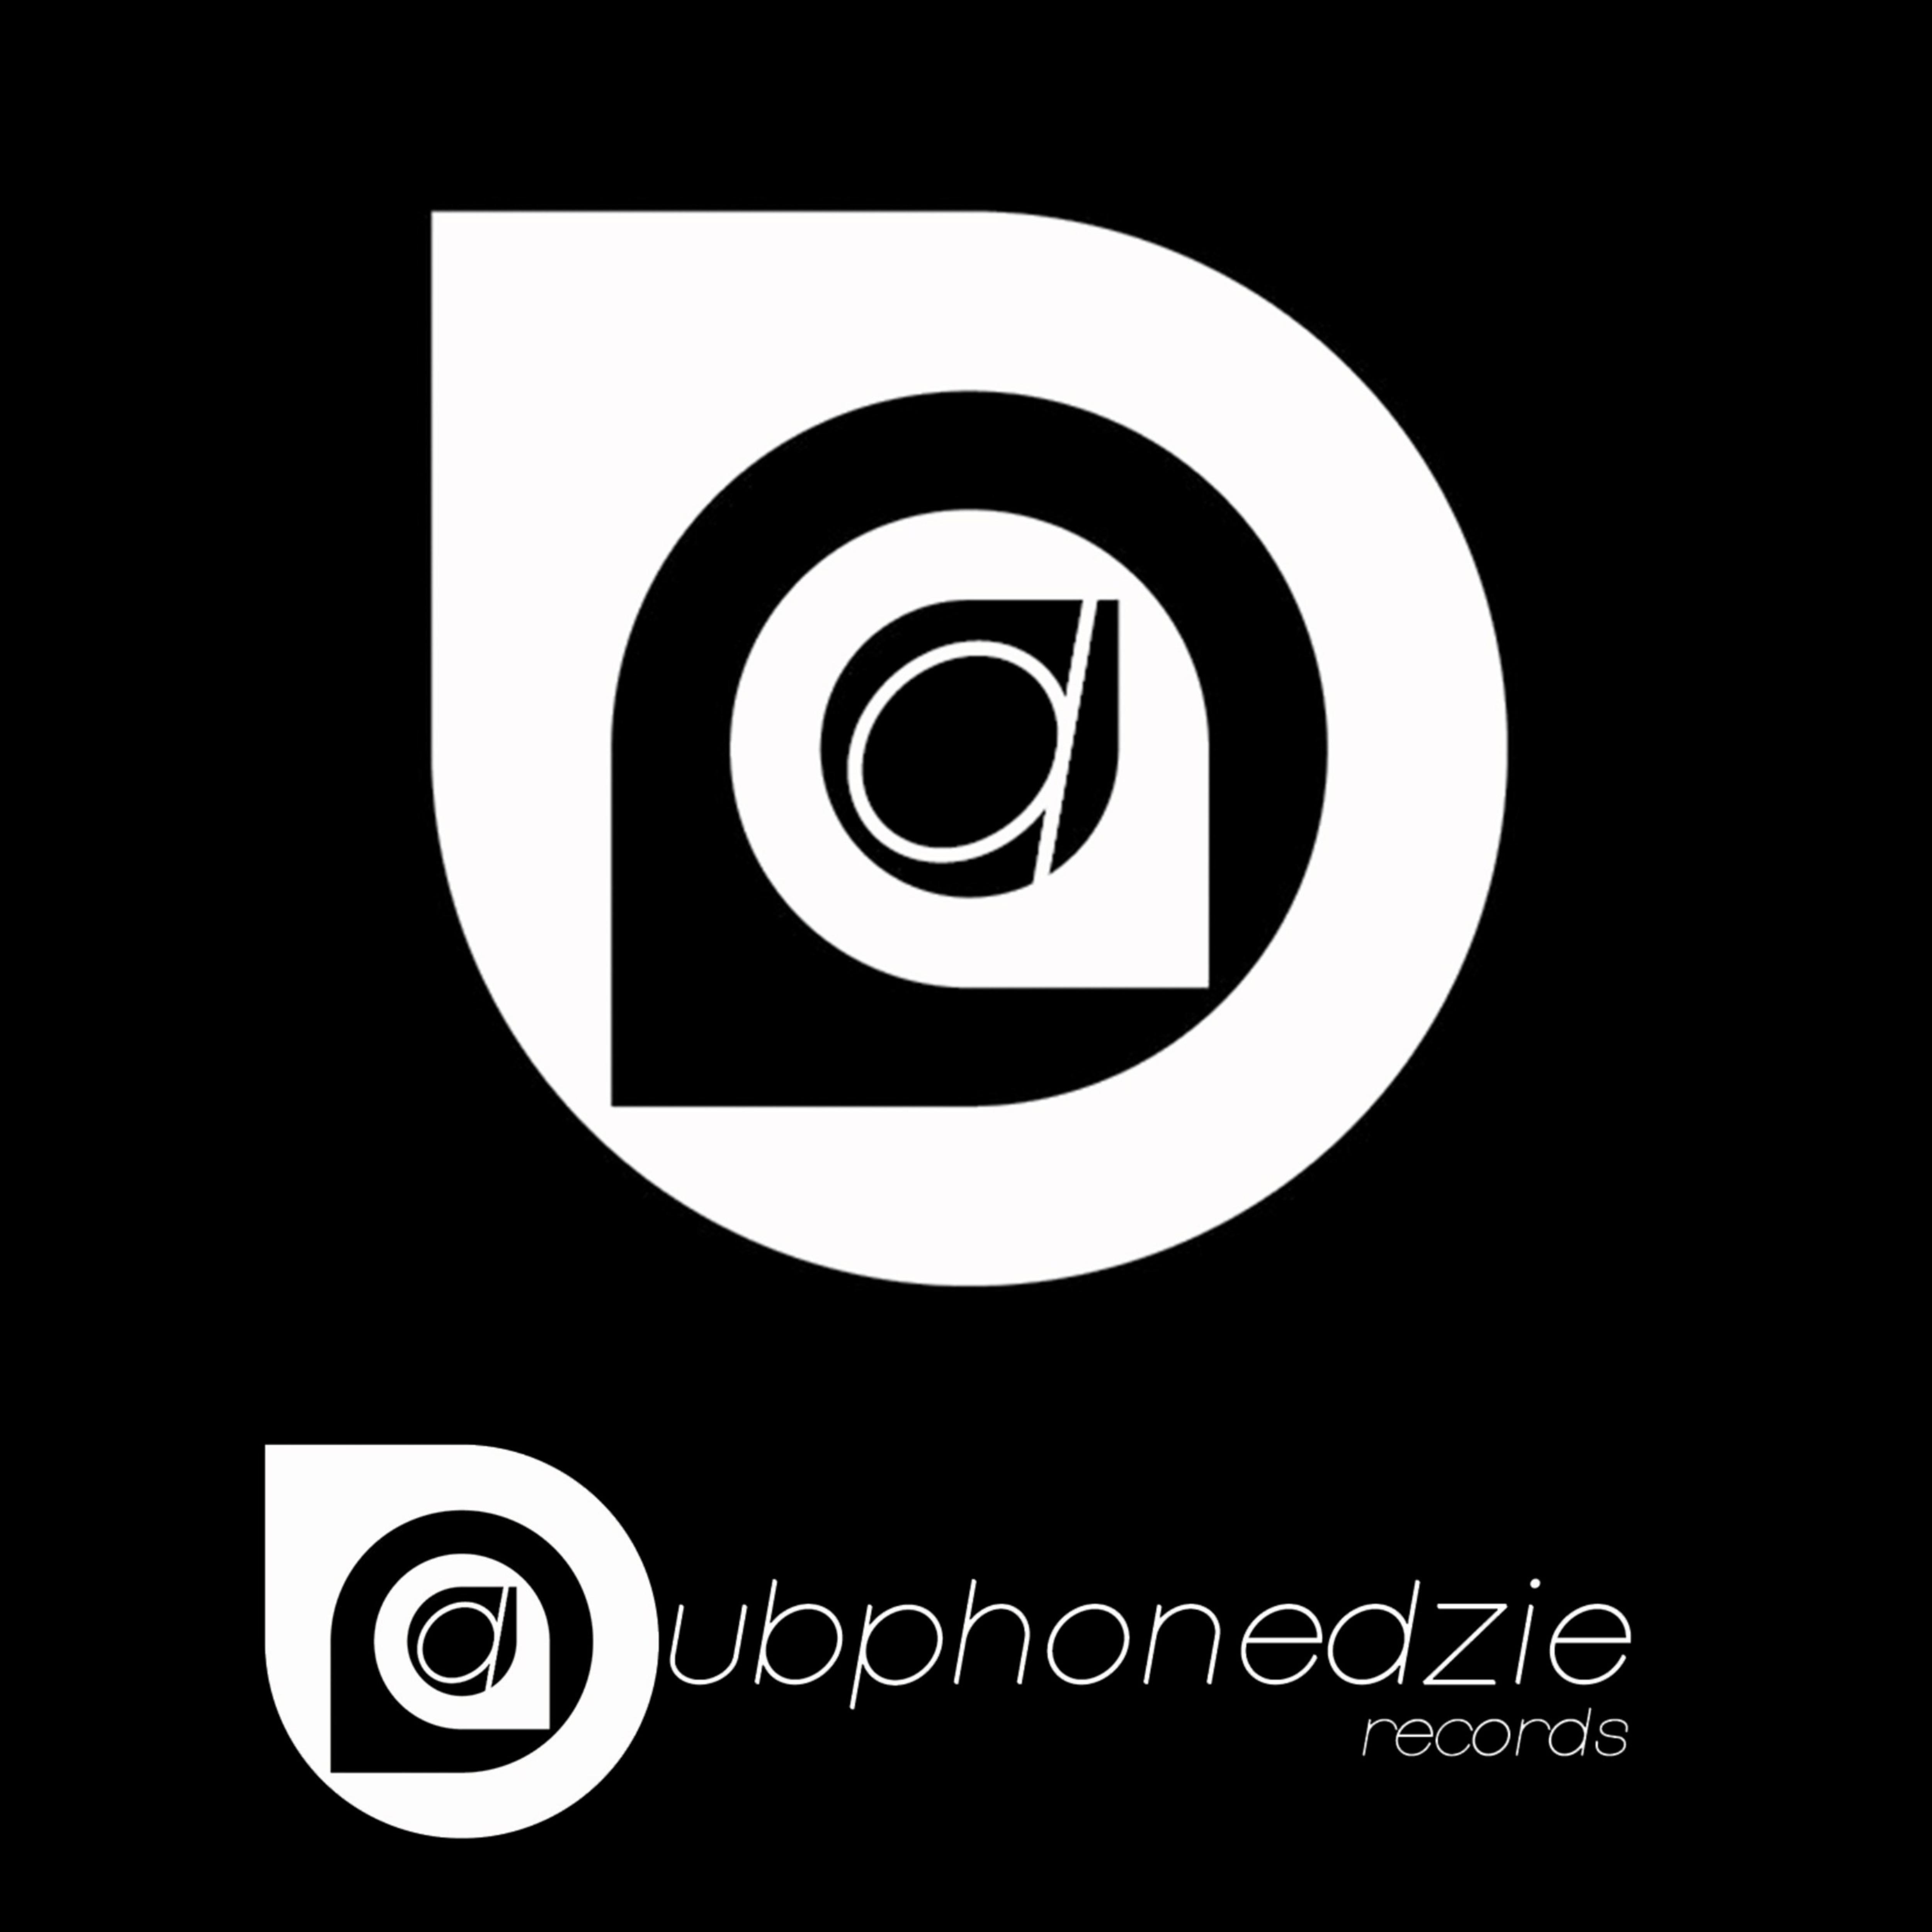 Dubphonedzie Records